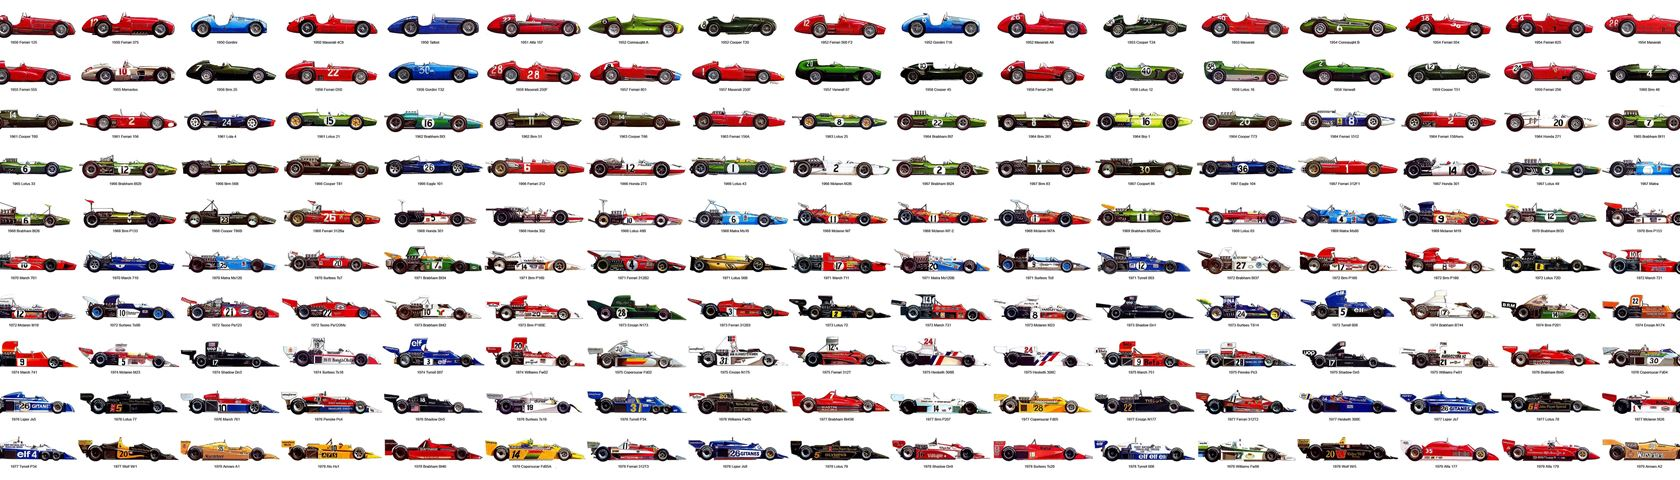 Formula 1 Cars: 1950 to 1979